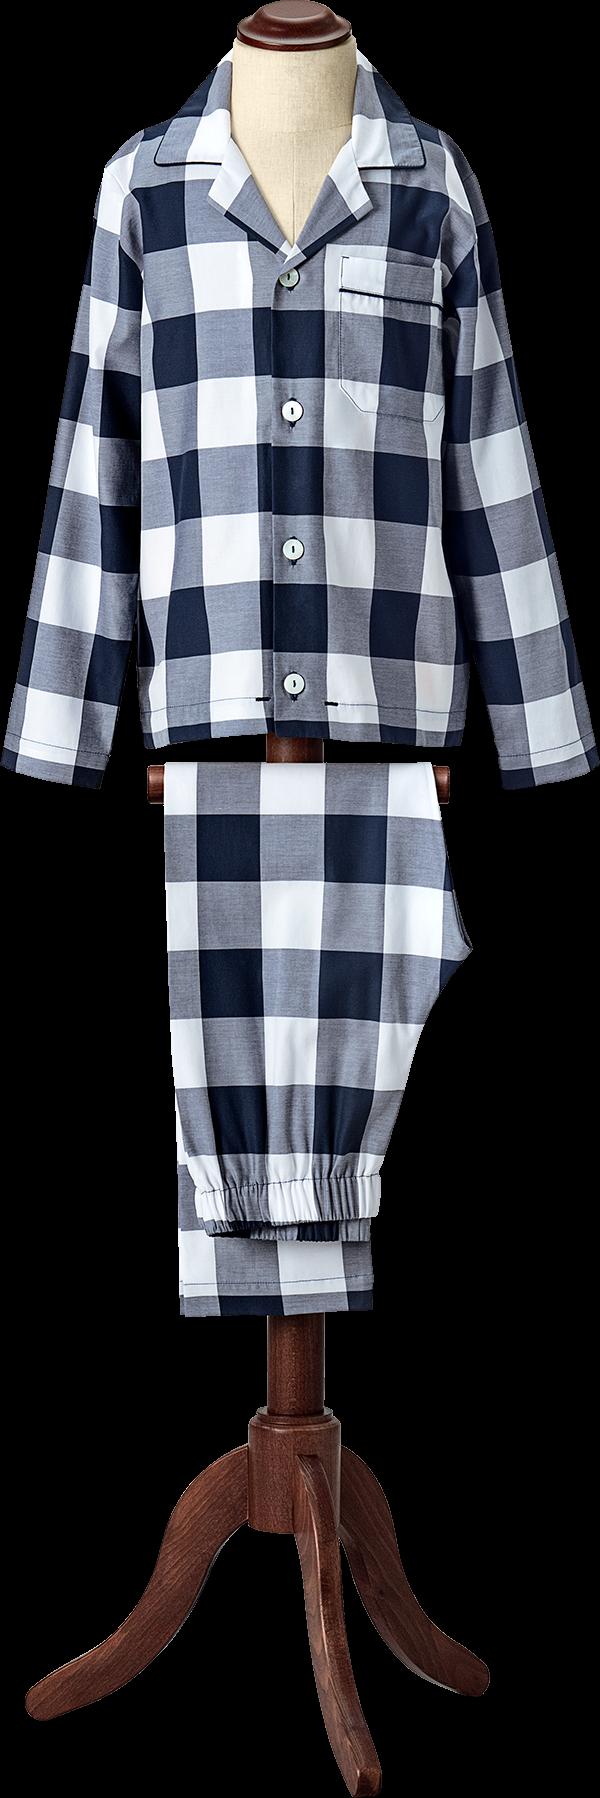 Hastens Hastens Blue Check Pajamas